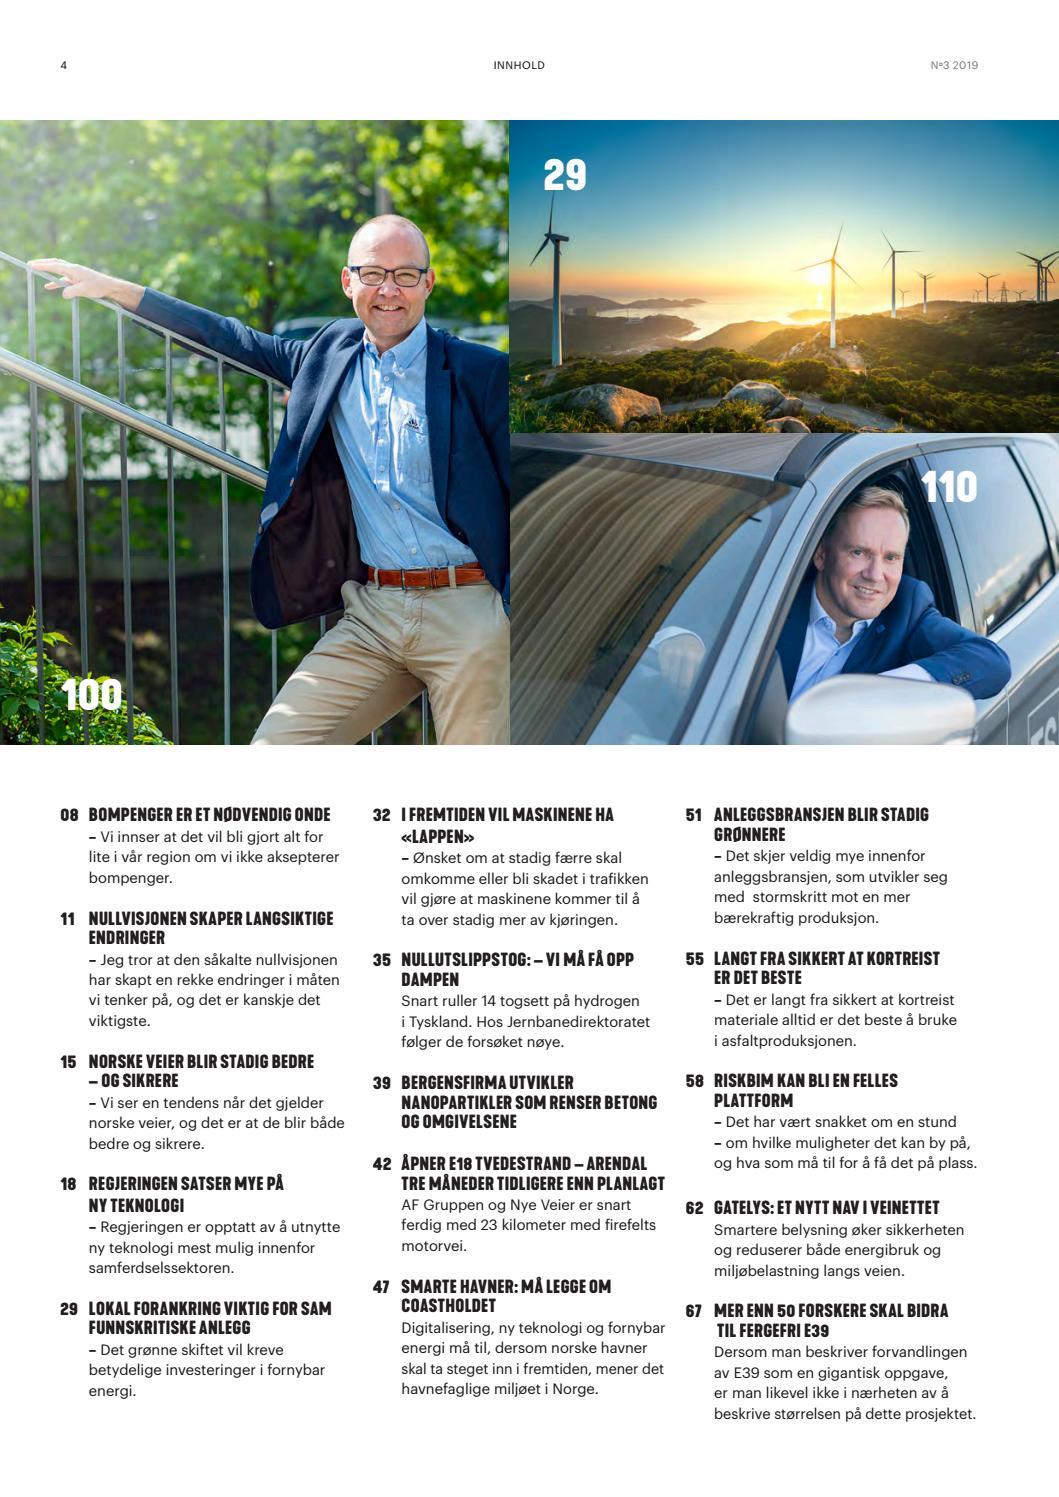 1d09ca96 Samferdsel & Infrastruktur 03.utgave by VALUE PUBLISHING - issuu